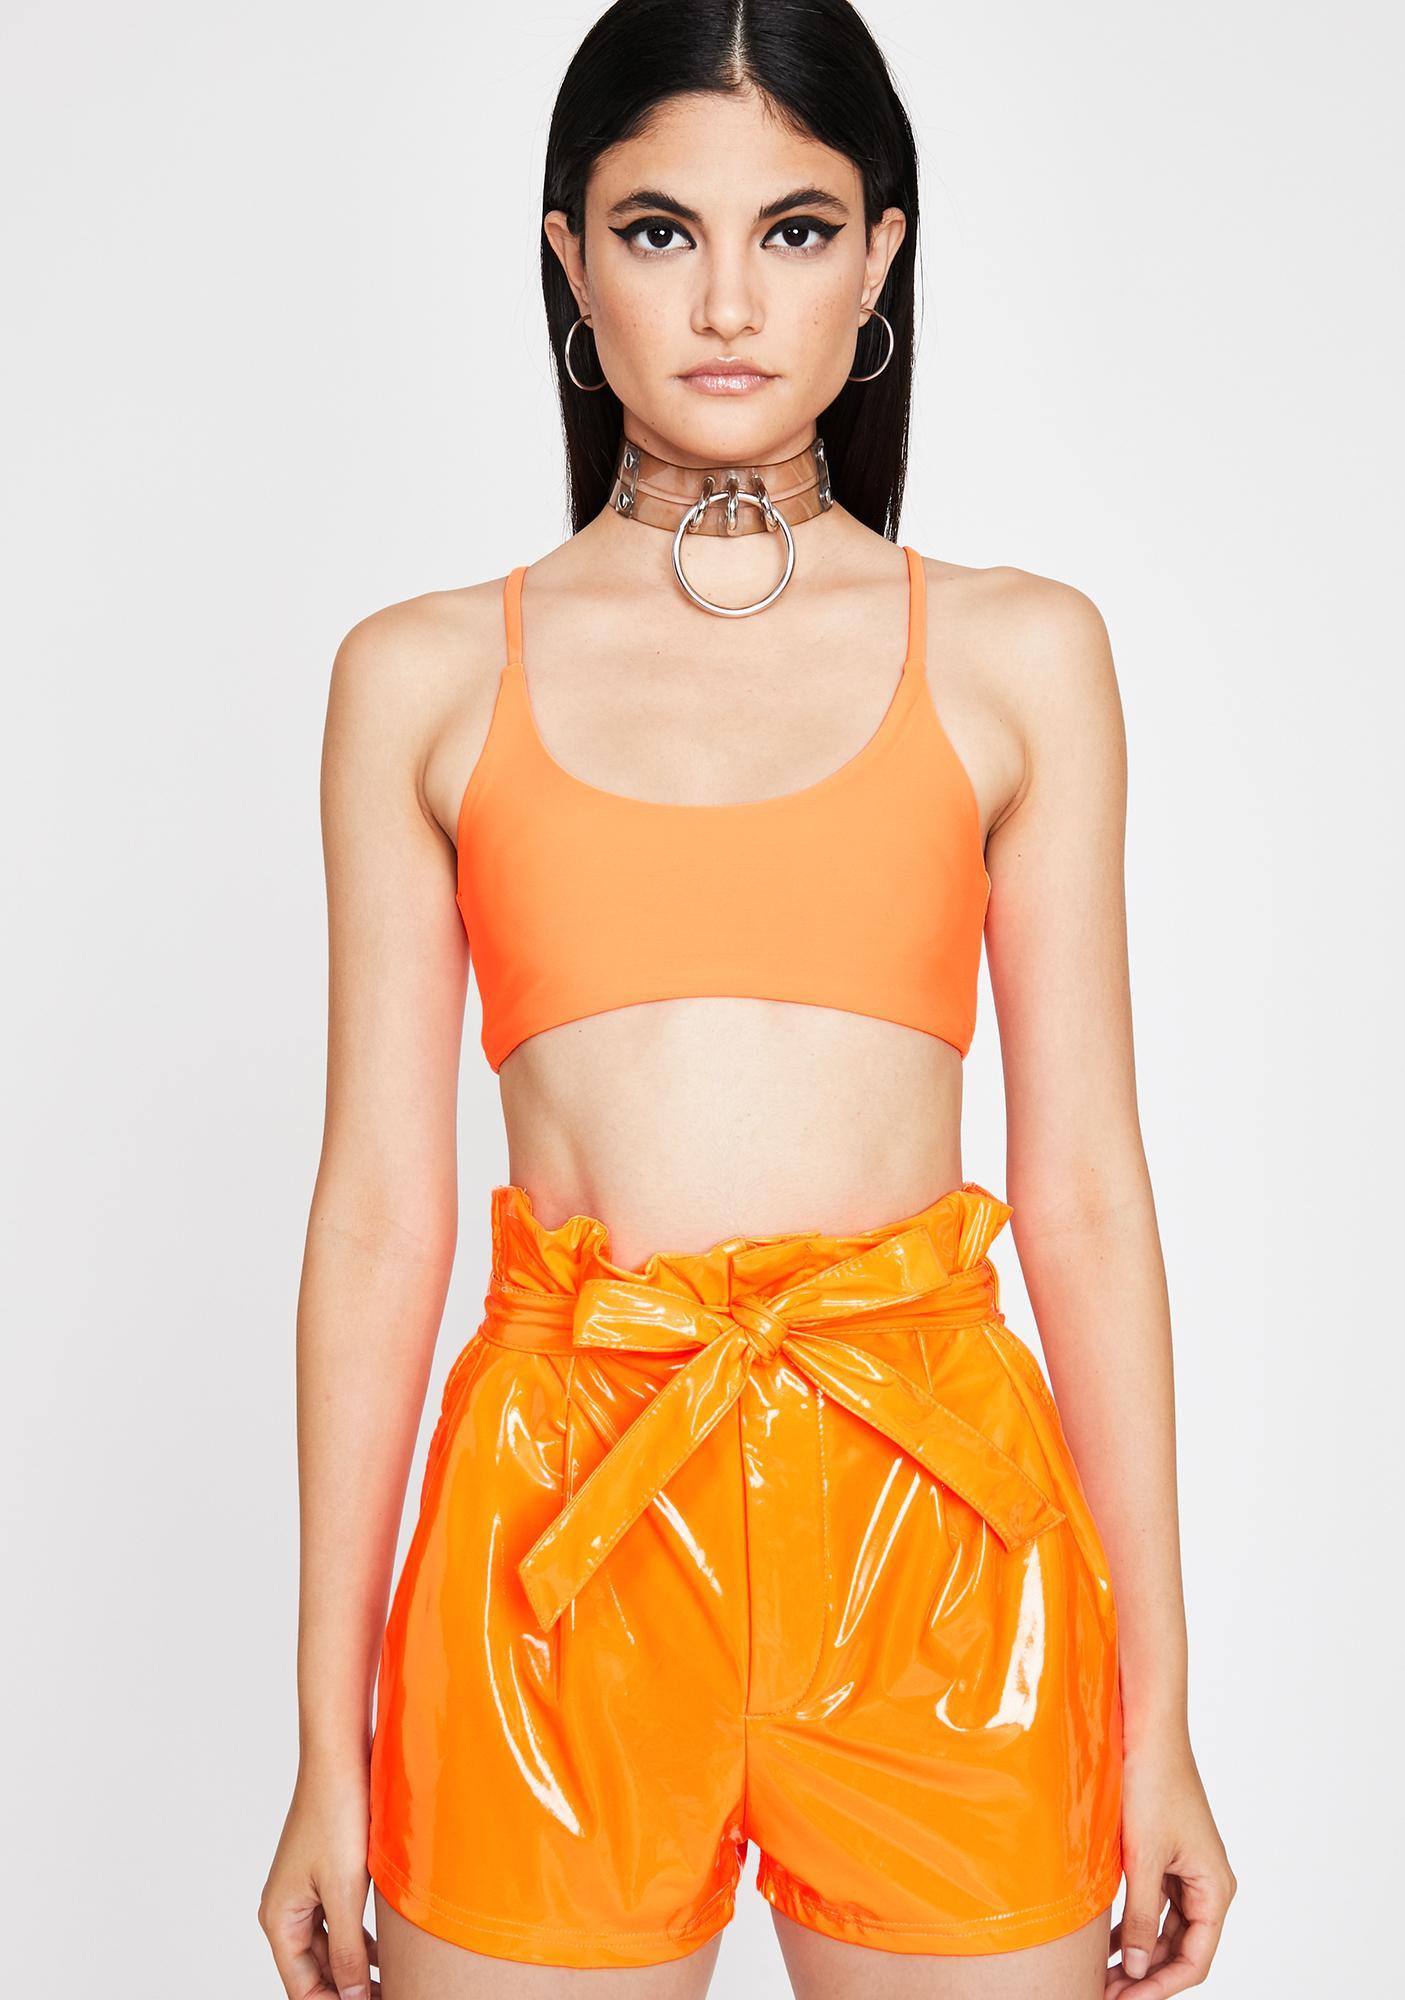 Citrus Candy Wrapper Vinyl Shorts